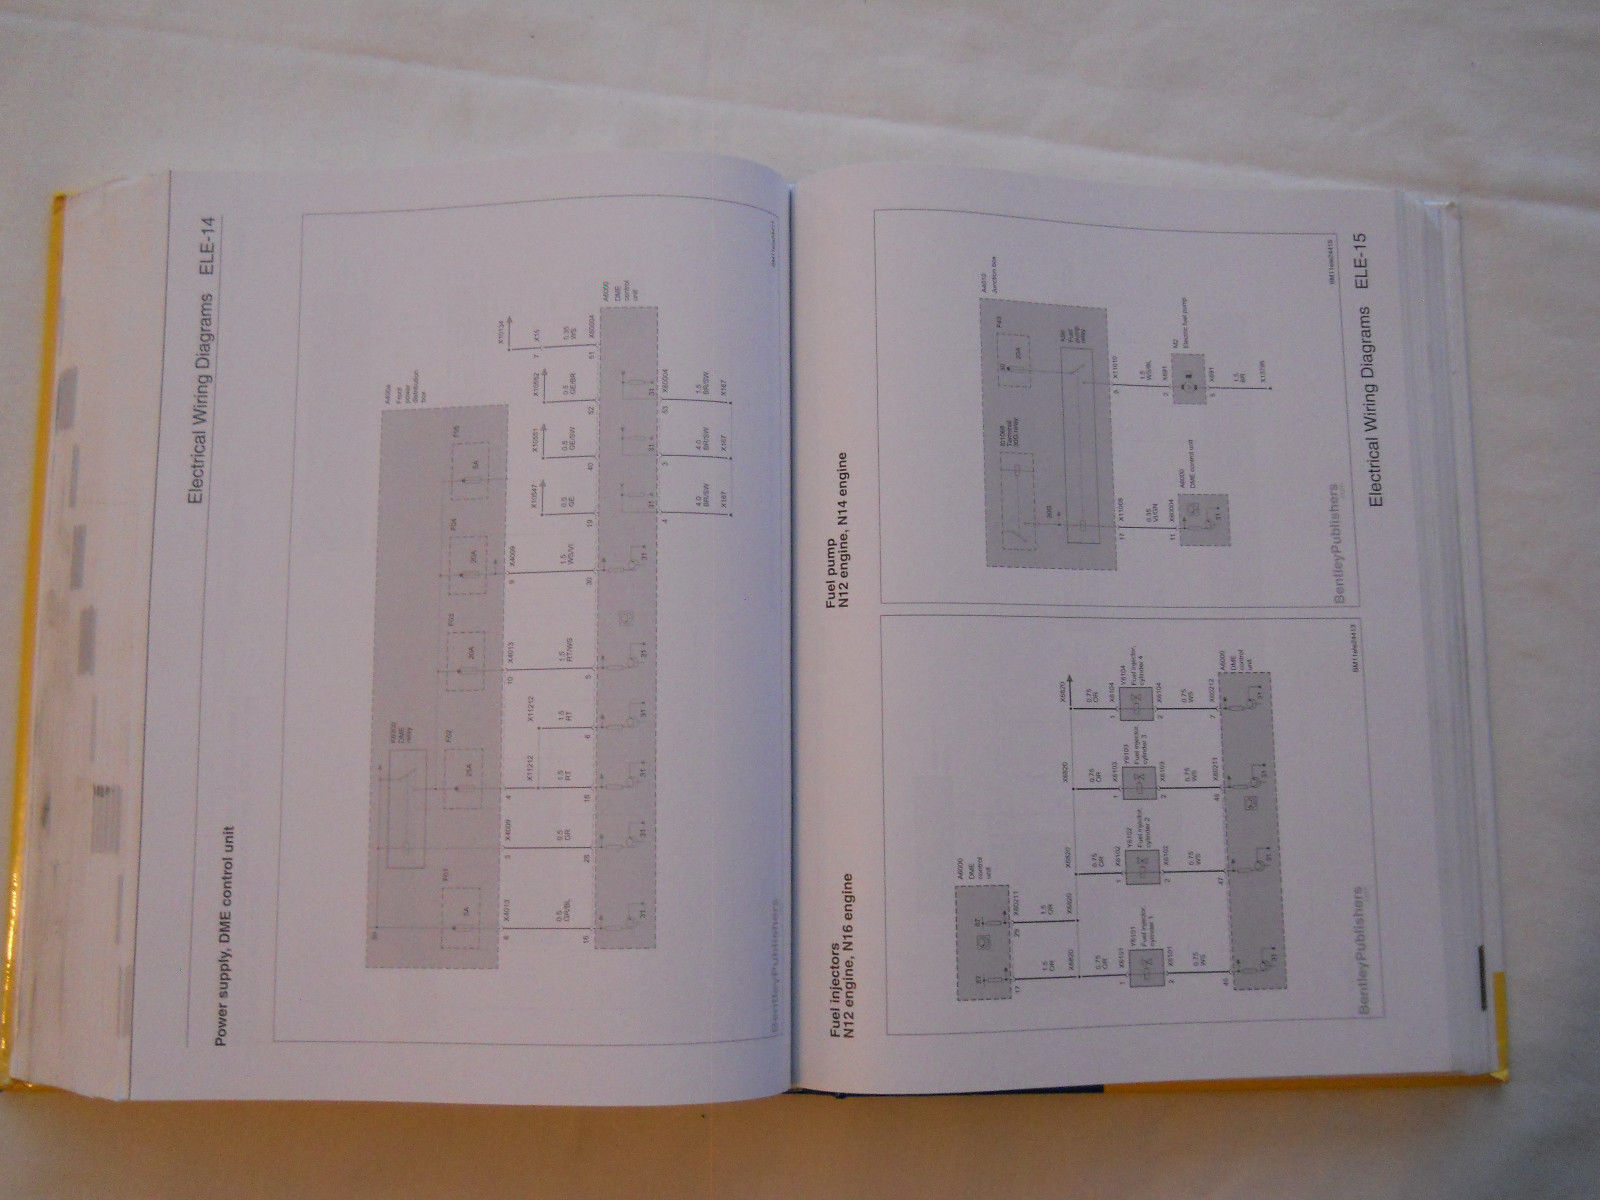 hight resolution of mini cooper r56 r55 r57 bentley service manual 2007 2011 s l16007